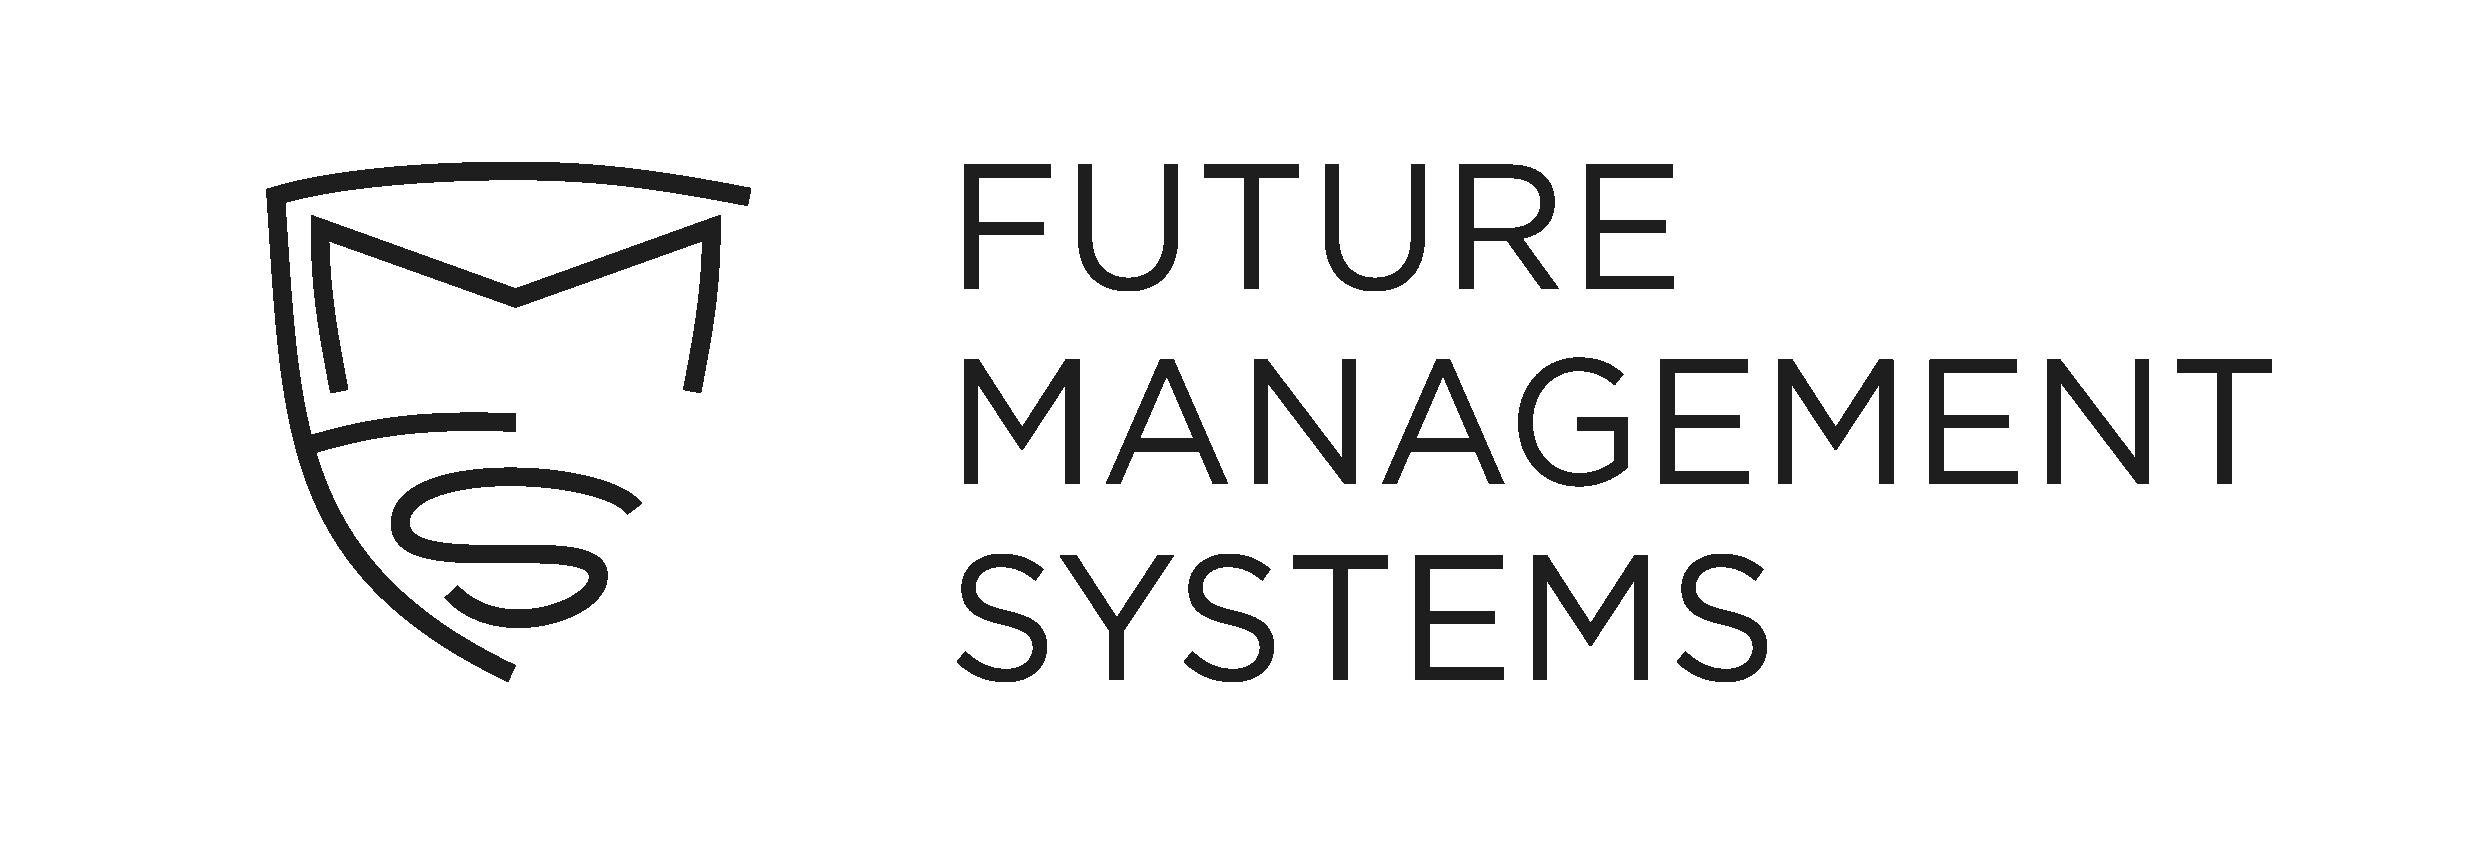 Future Management Systems LTD